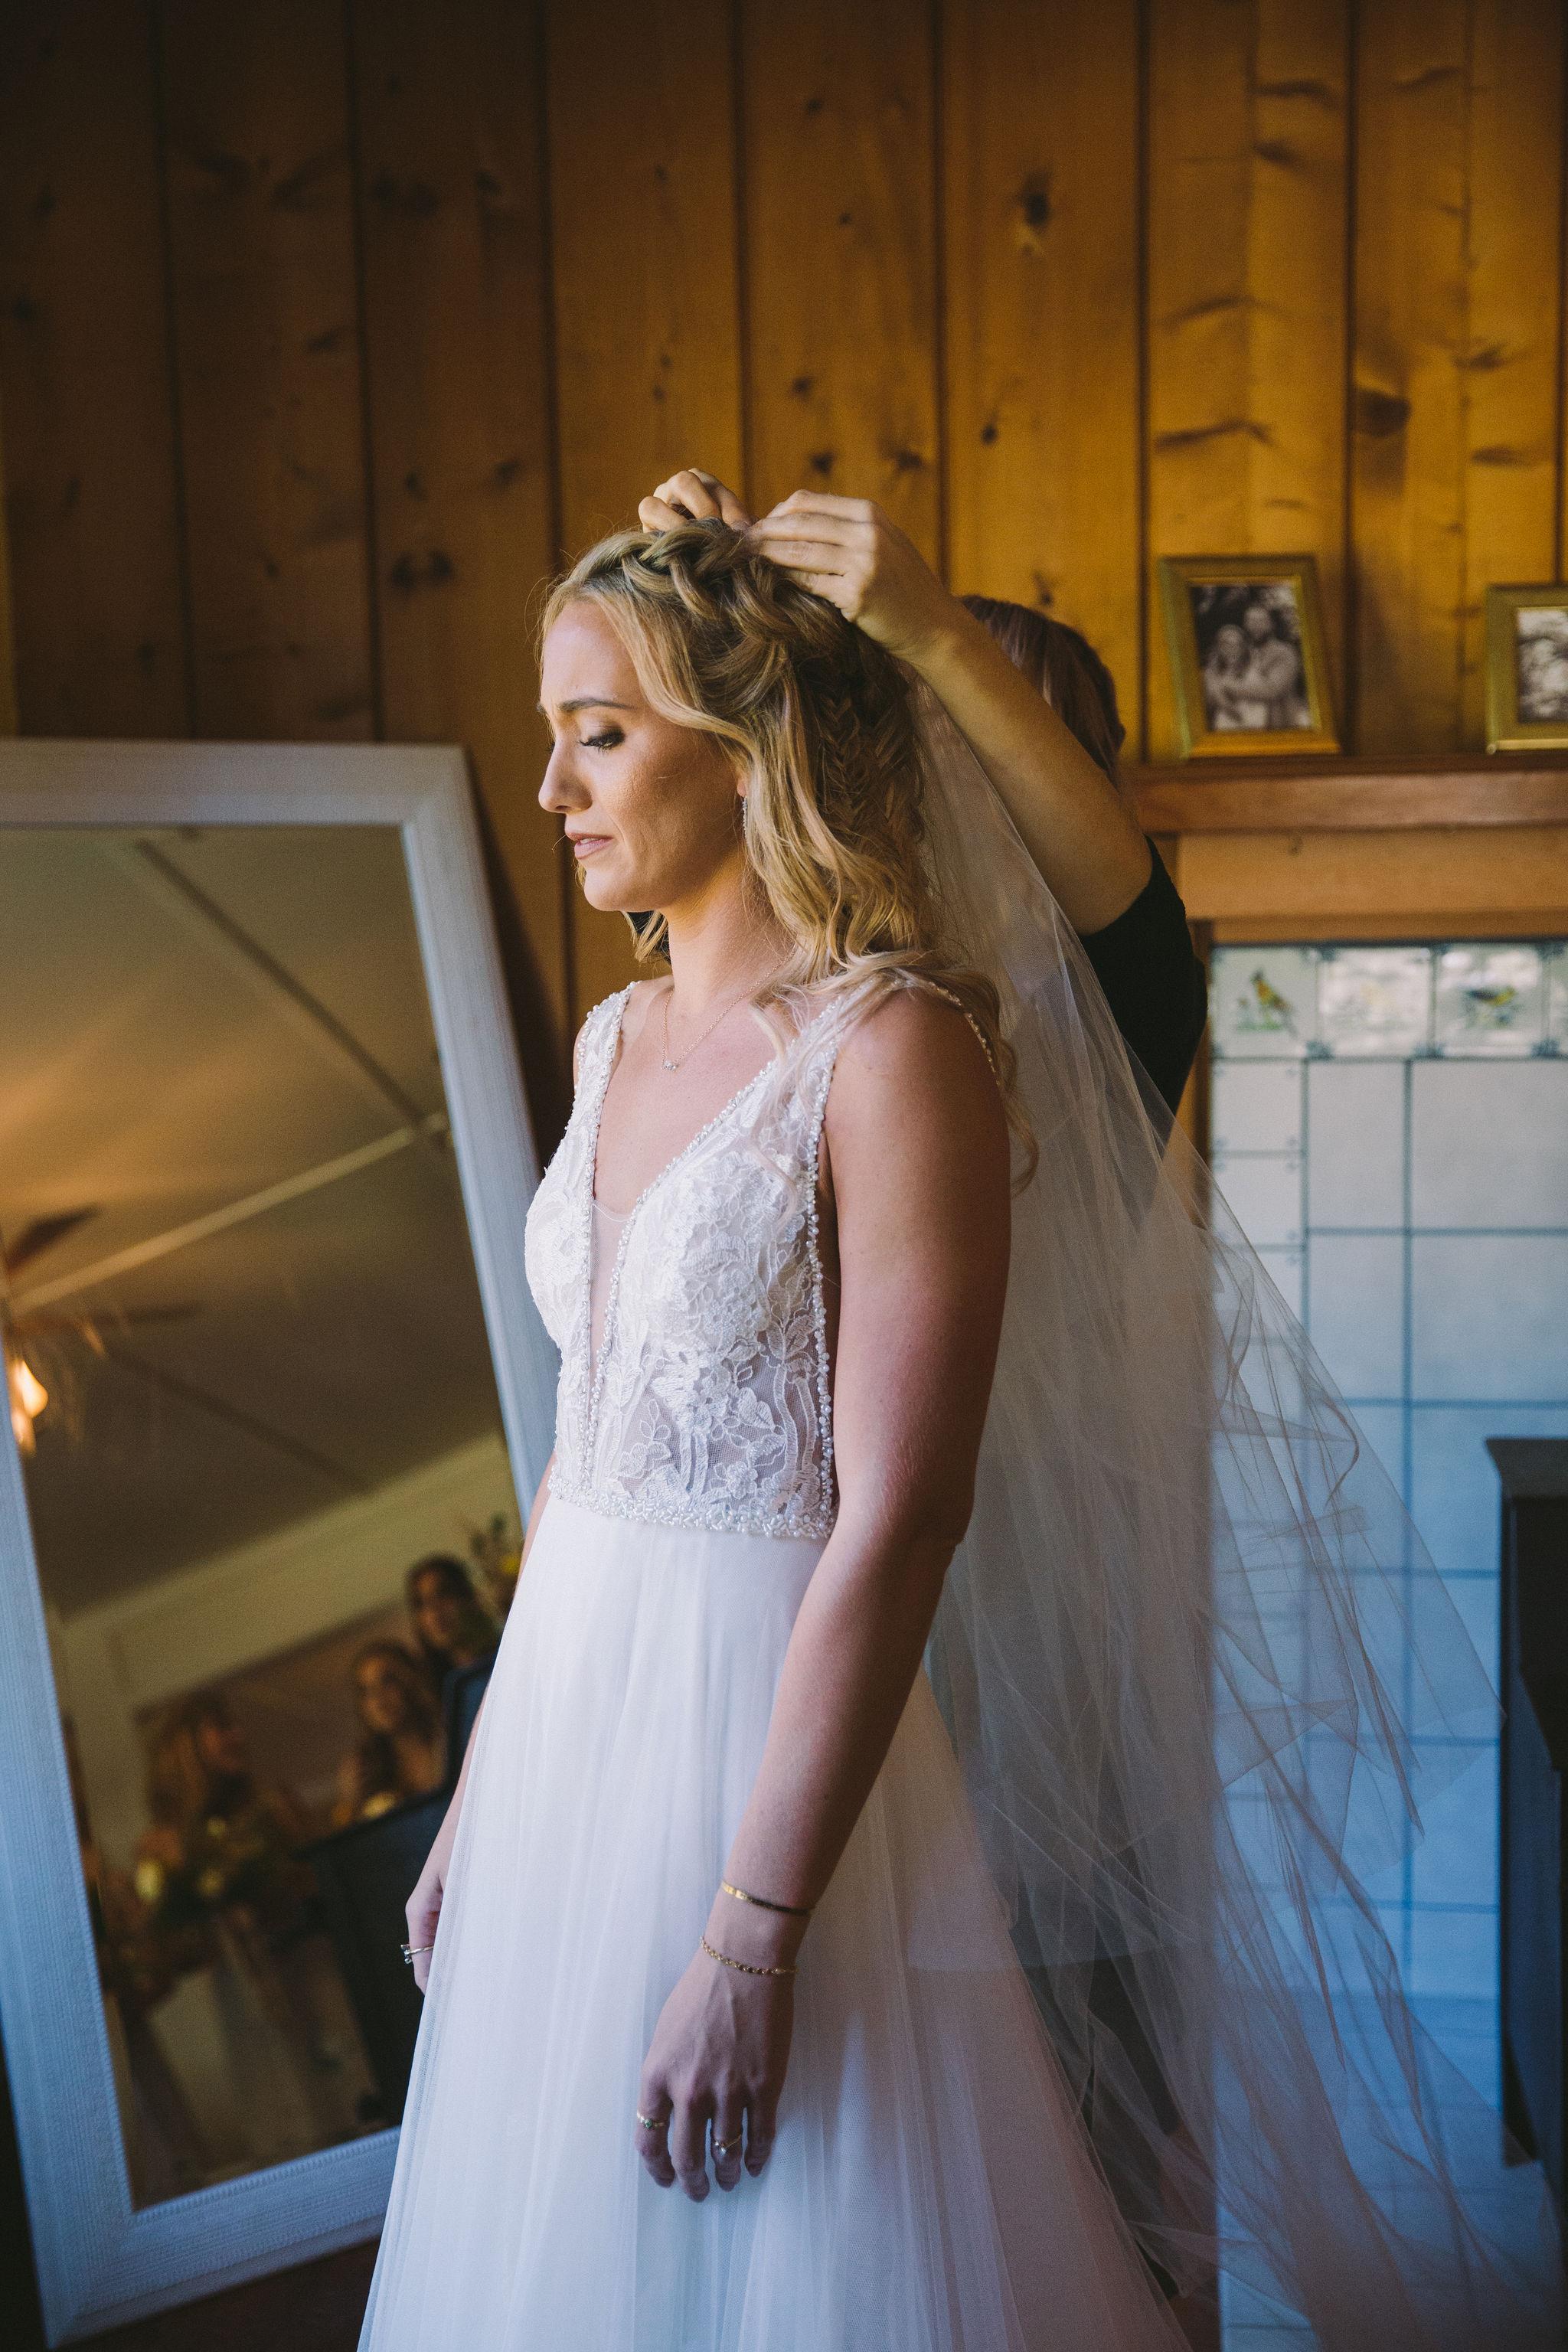 Jesseandlex_181103_AlexisNate_Wedding_GirlsPrep_184.jpg